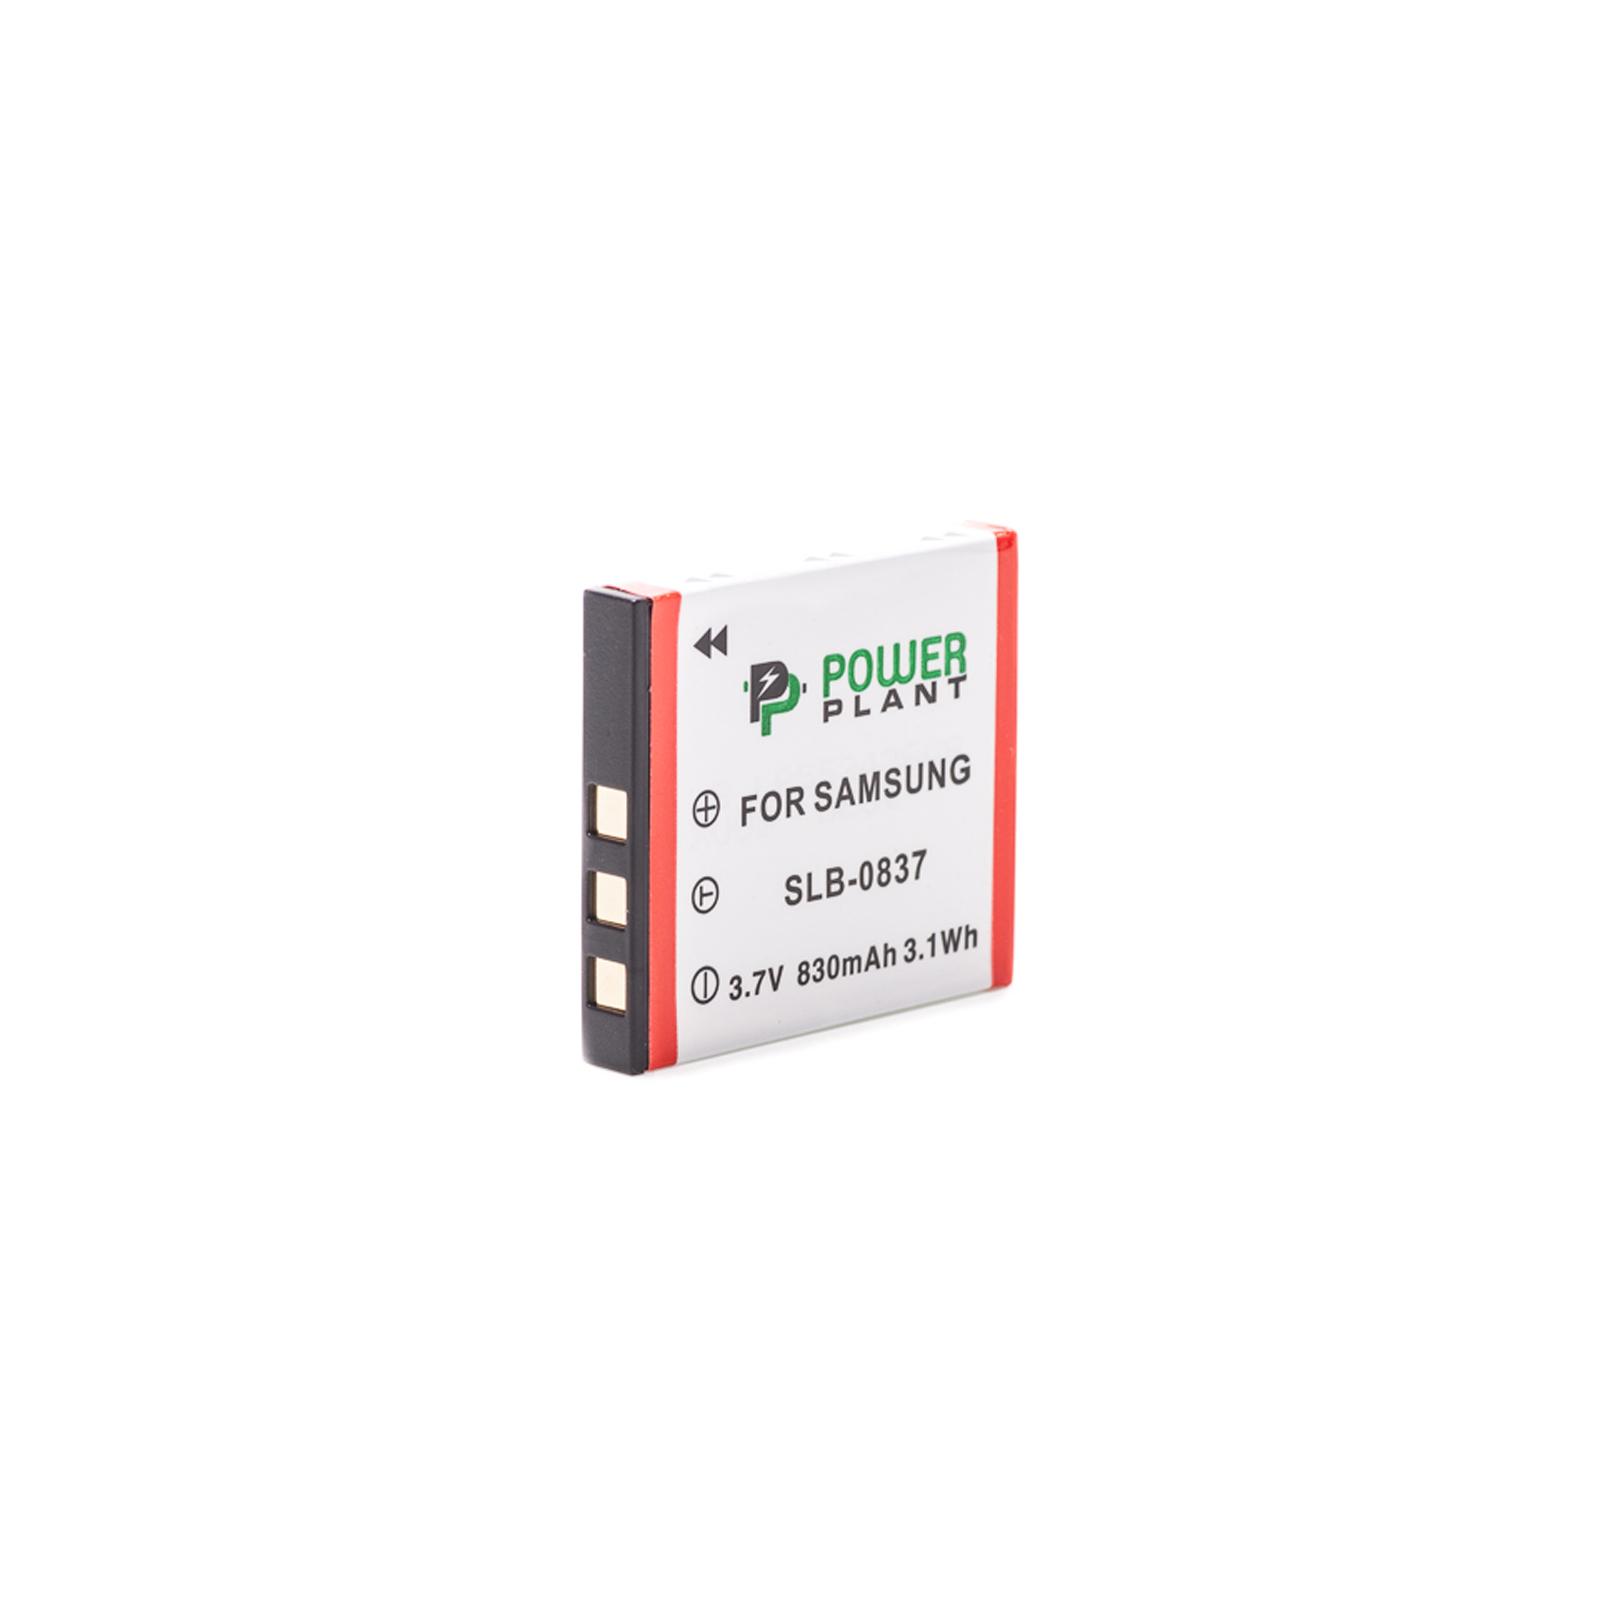 Аккумулятор к фото/видео PowerPlant Samsung SB-L0837 (DV00DV1202) изображение 2